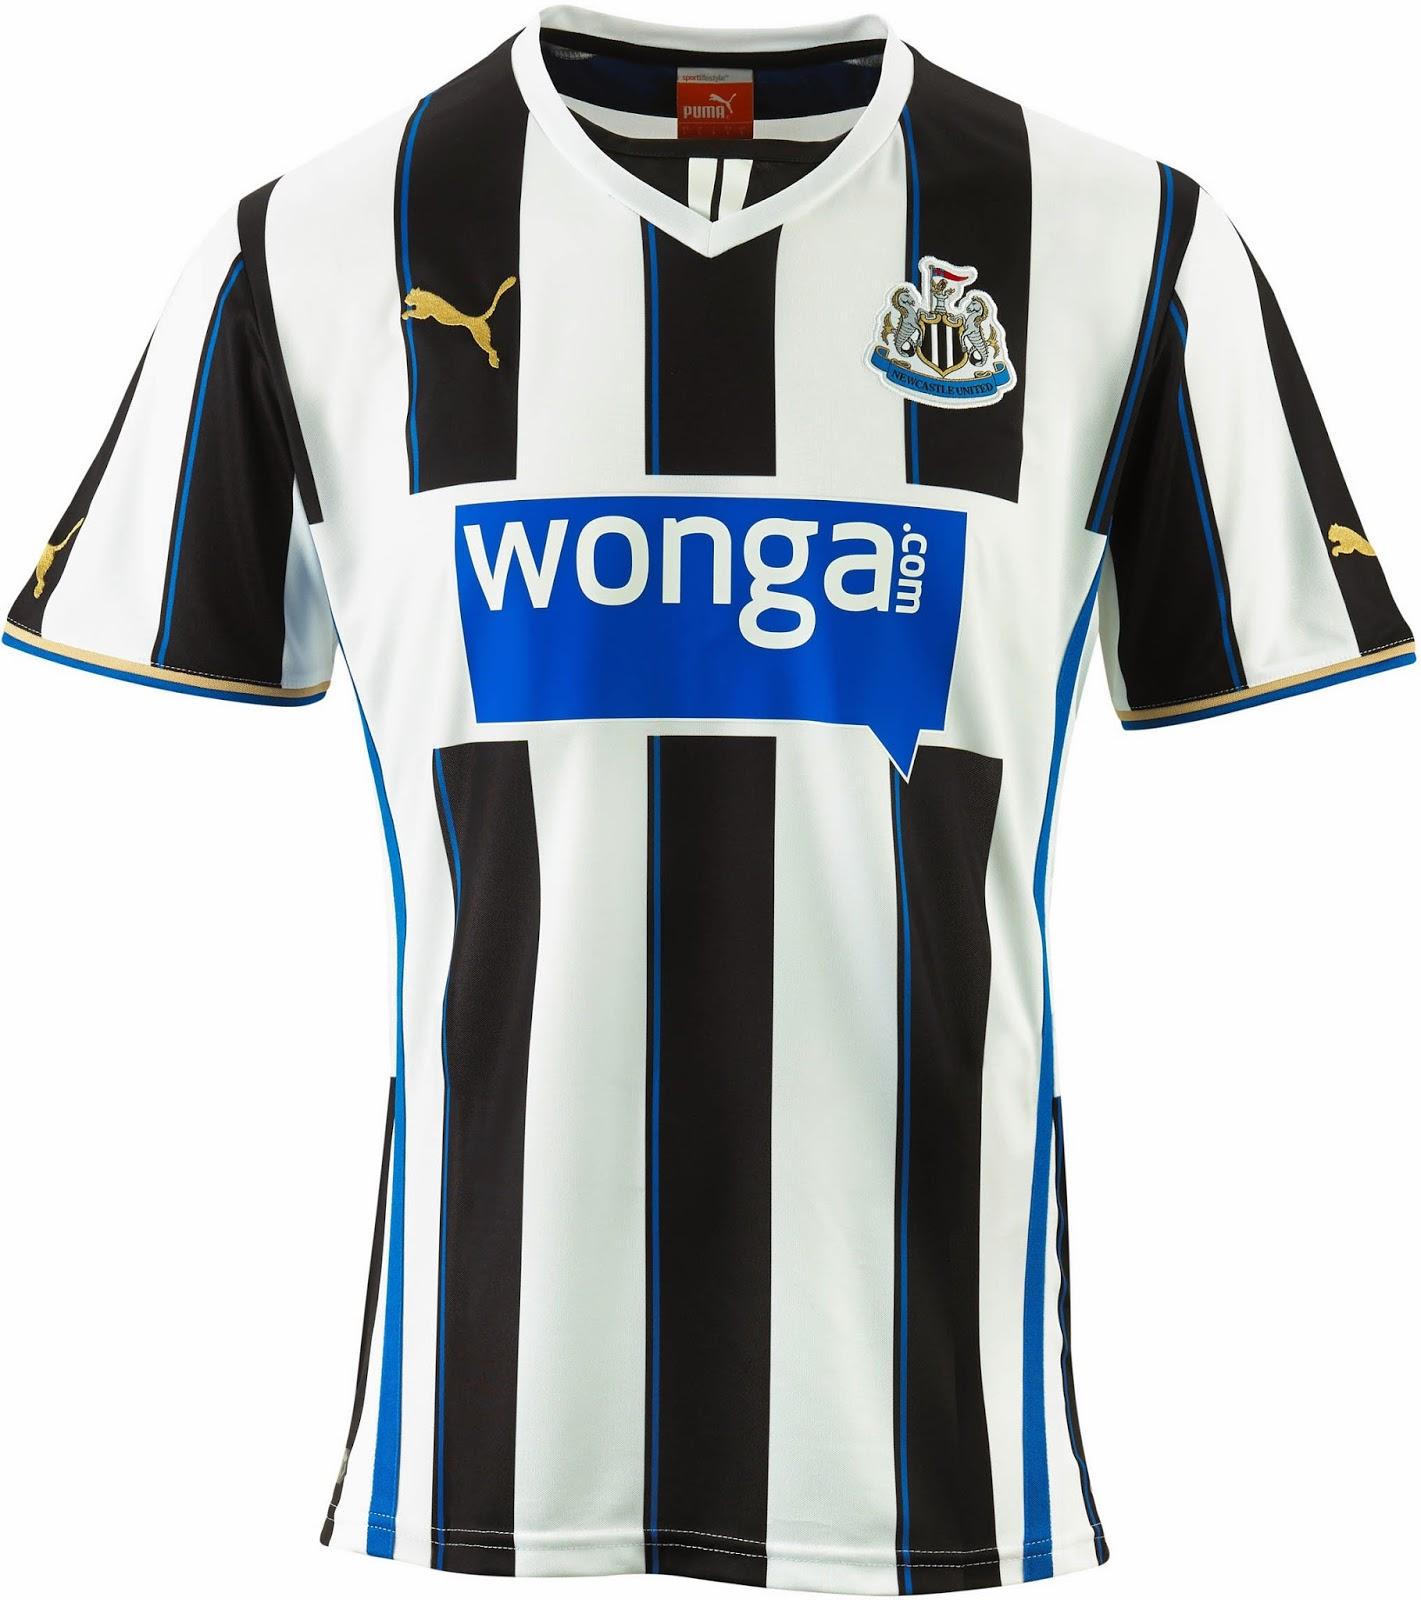 Newcastle united 13 14 2013 14 puma home away third for Newcastle home